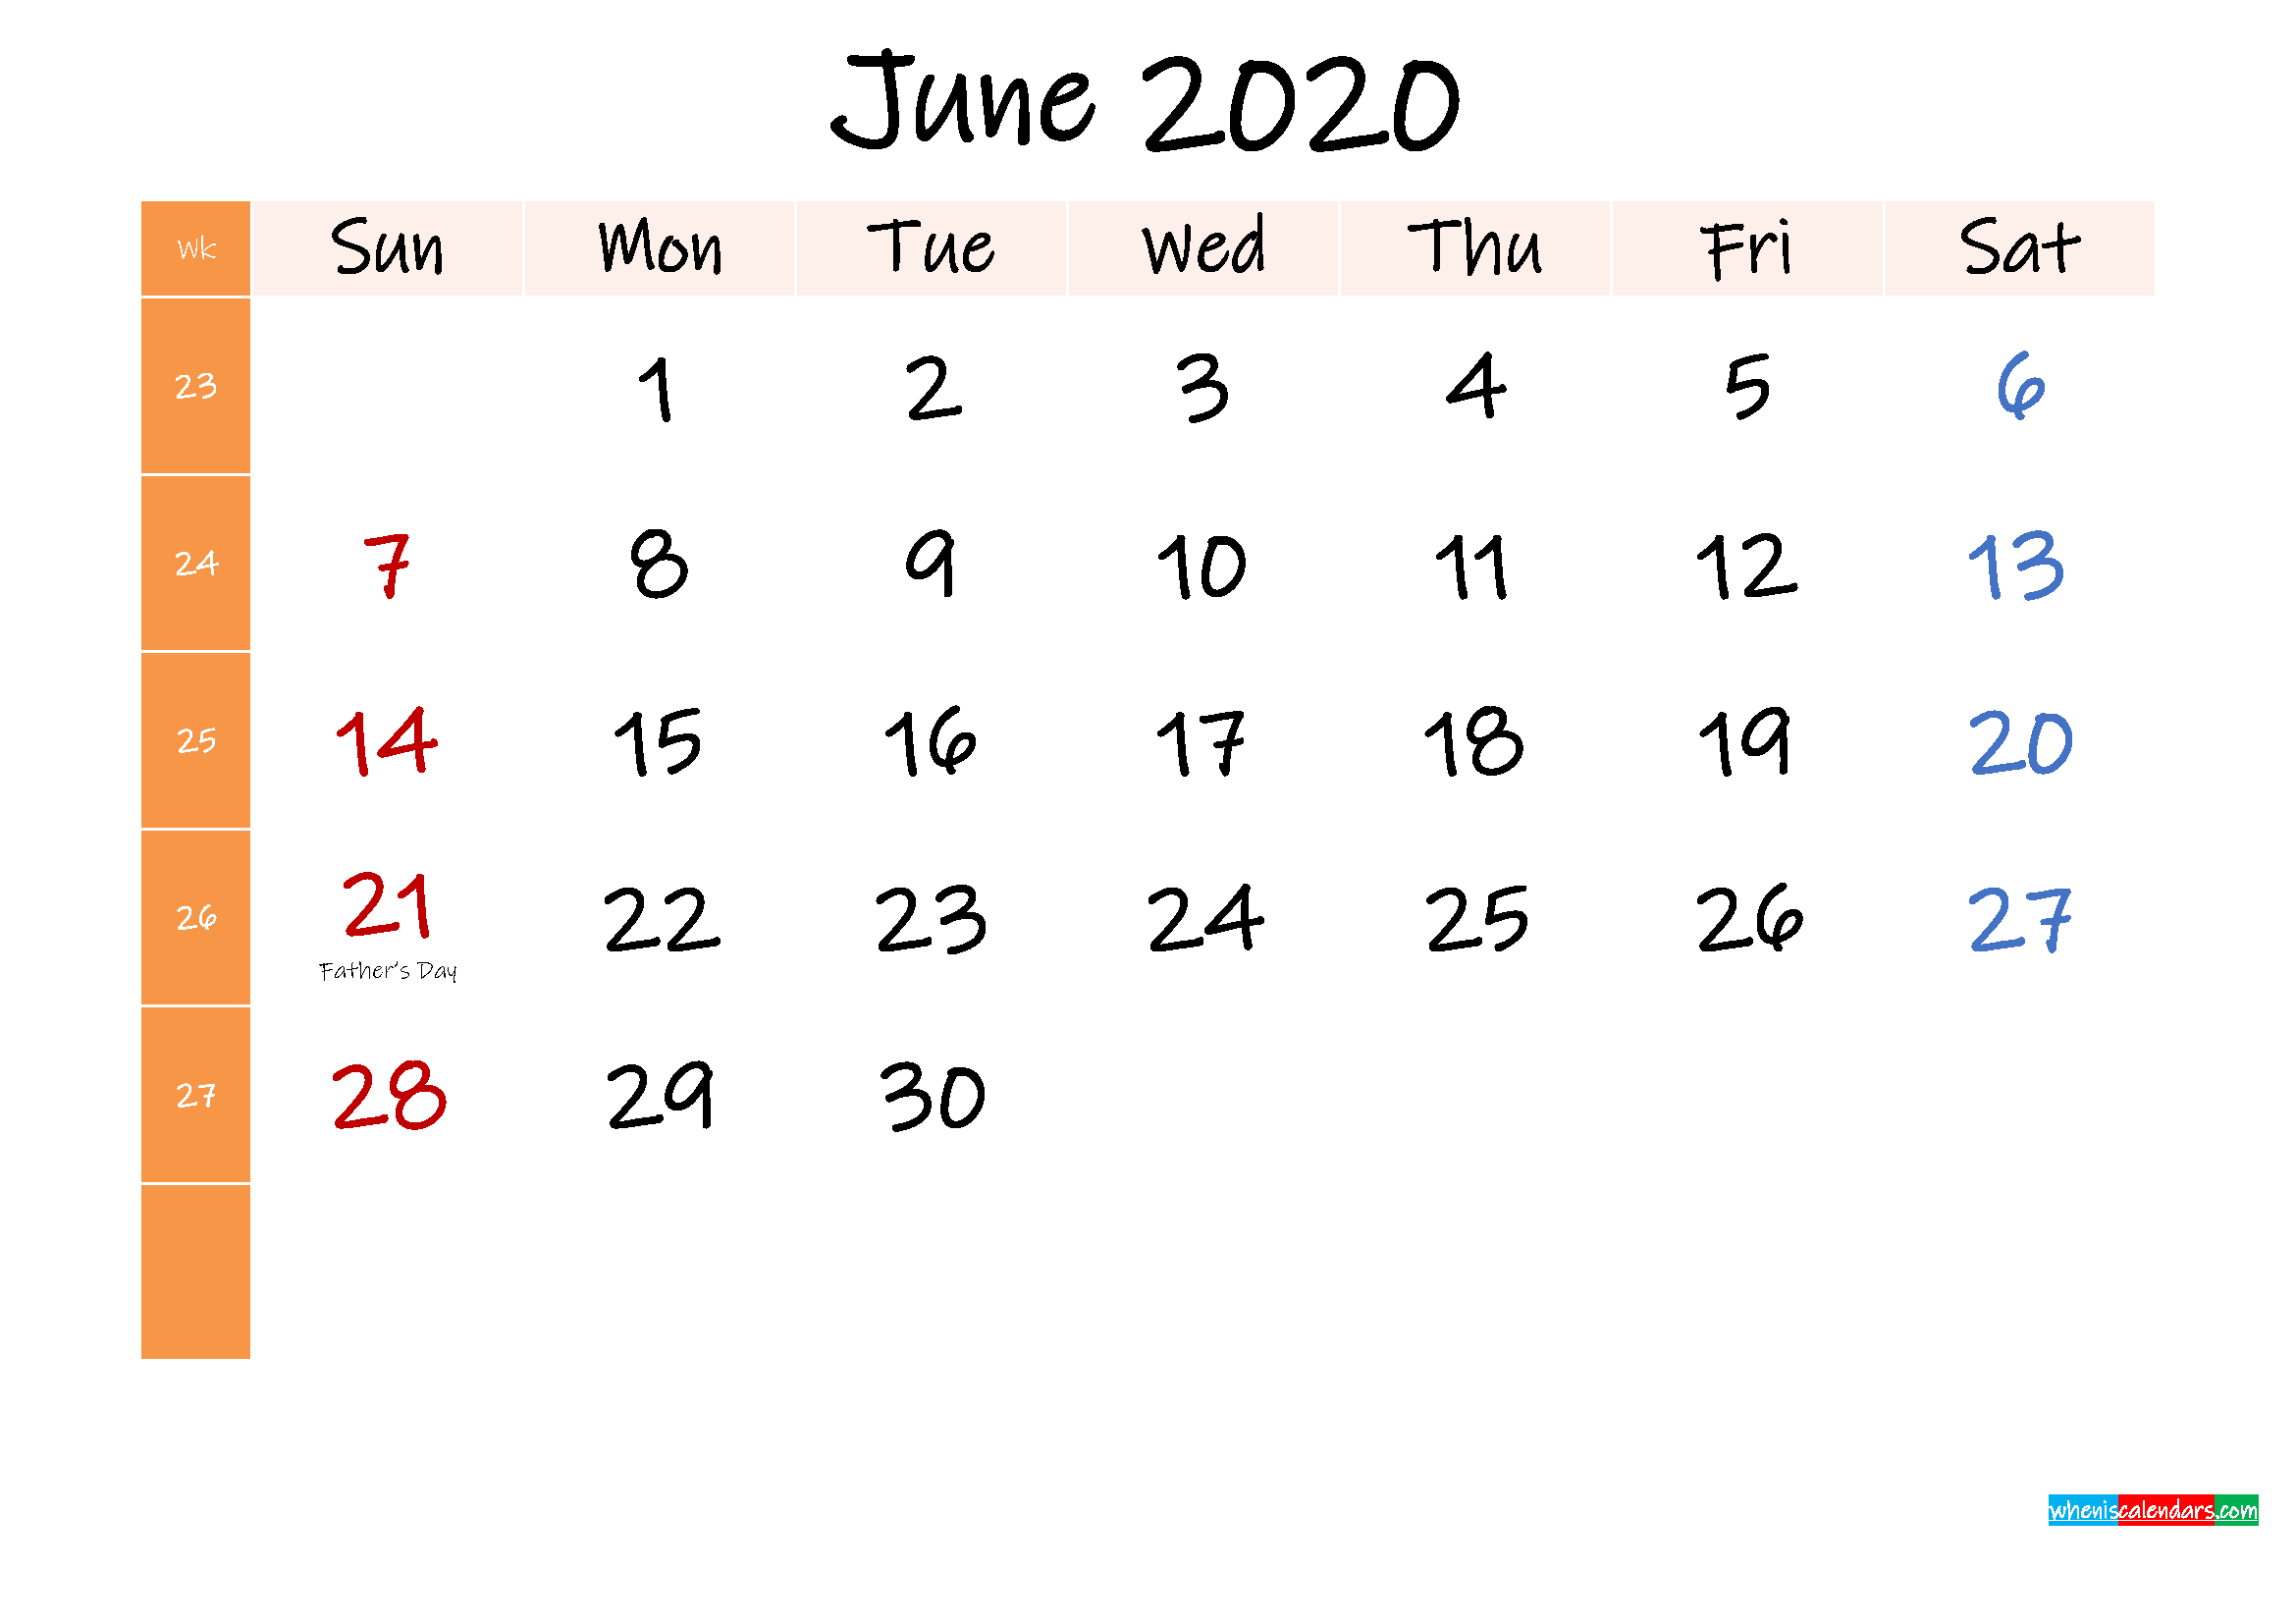 Free June 2020 Monthly Calendar Template Word